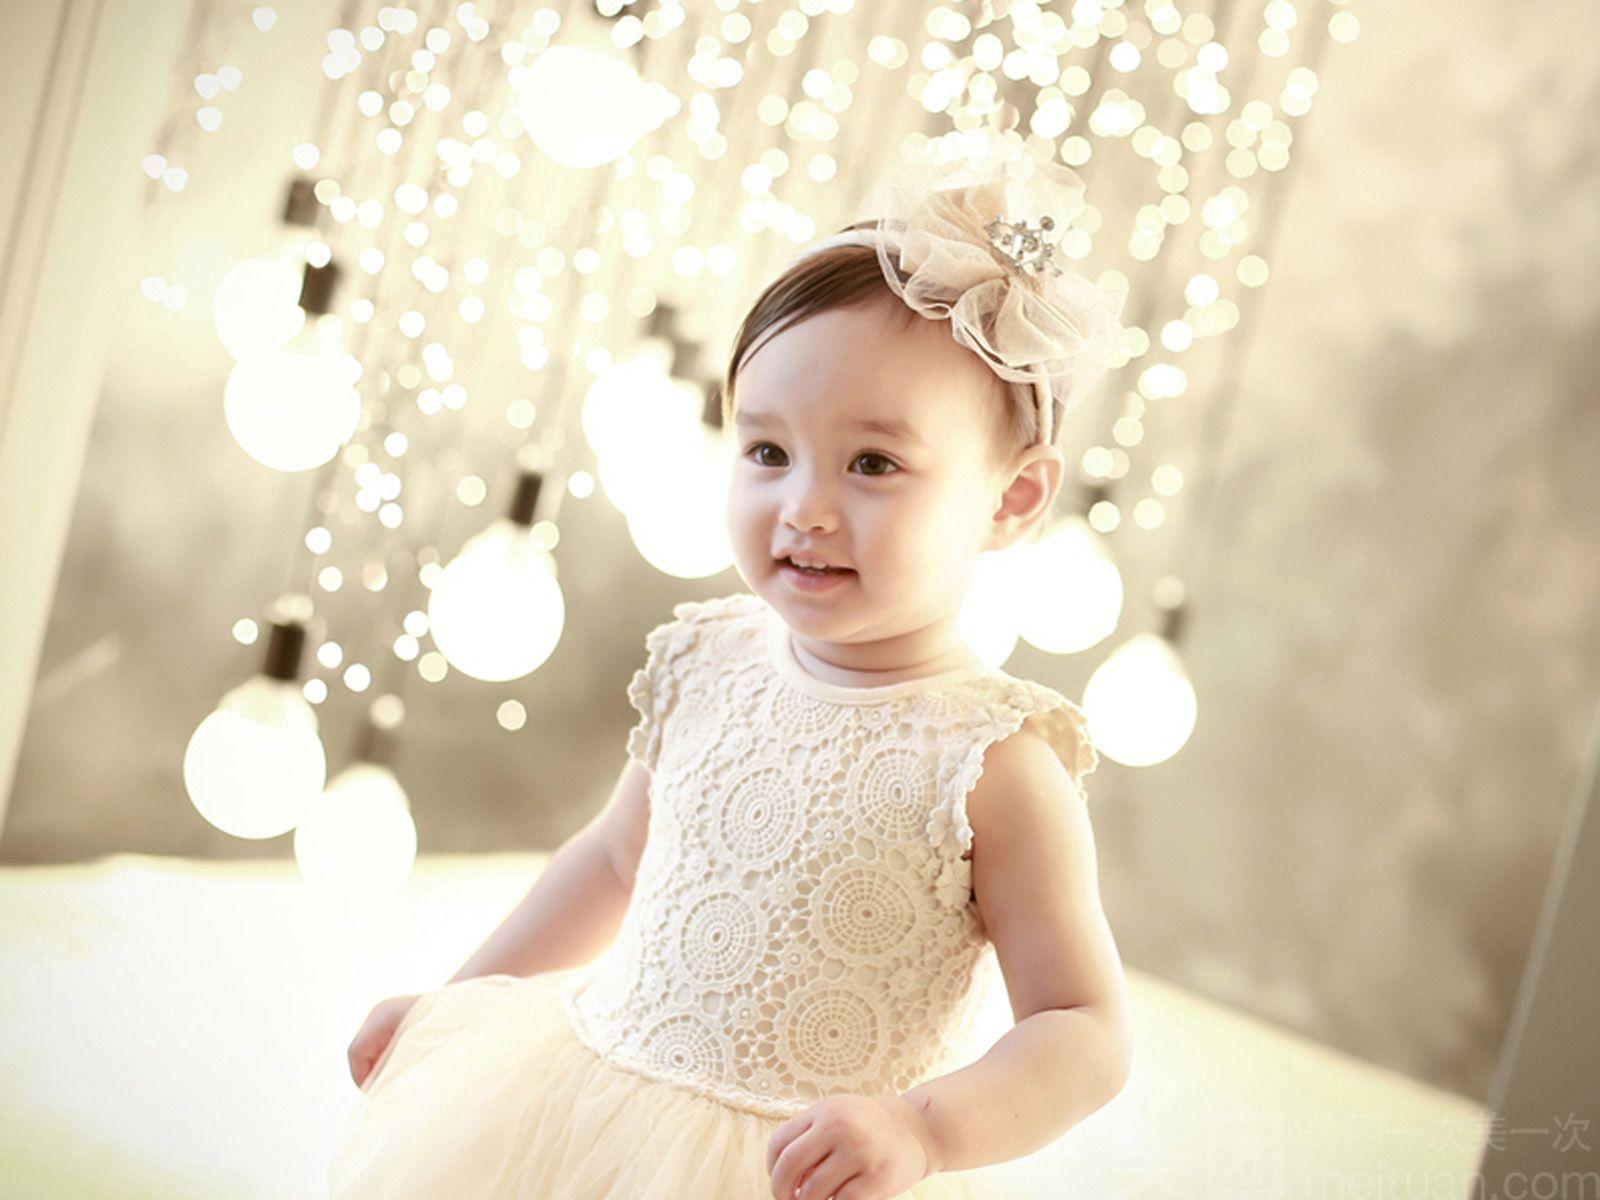 Toy baby 儿童摄影-美团